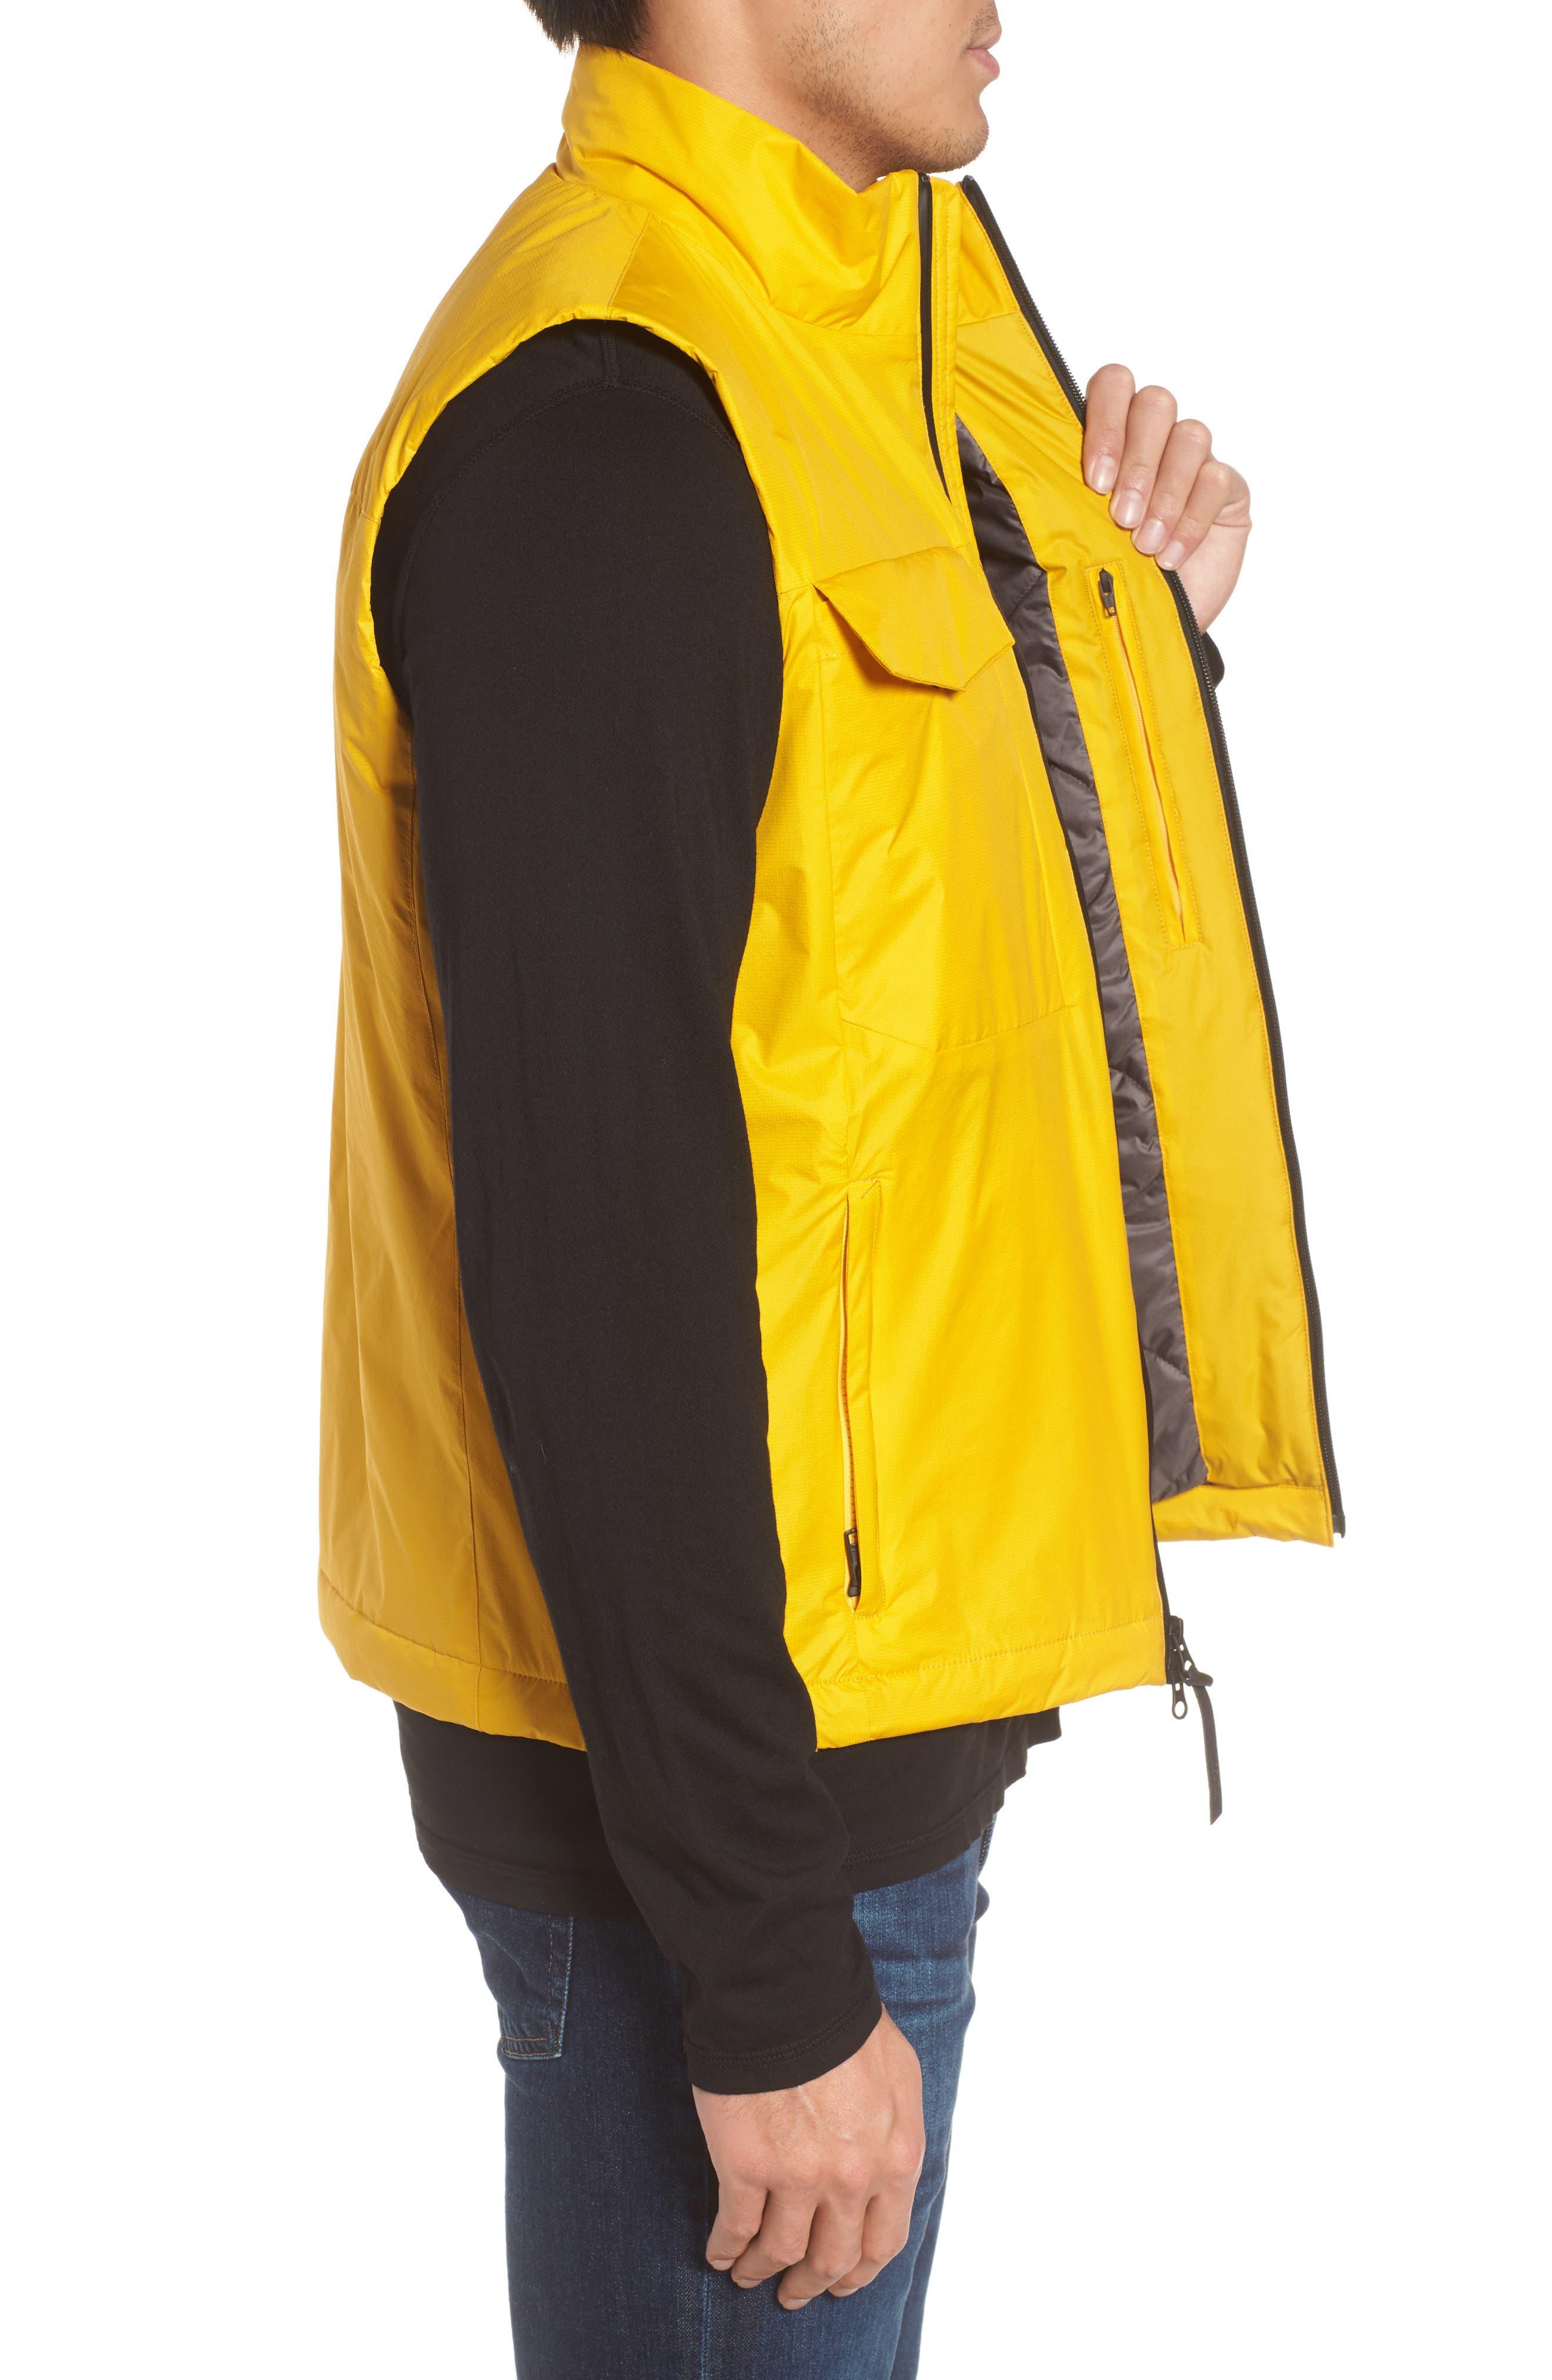 & Bros. Bering Vest,                             Alternate thumbnail 3, color,                             700